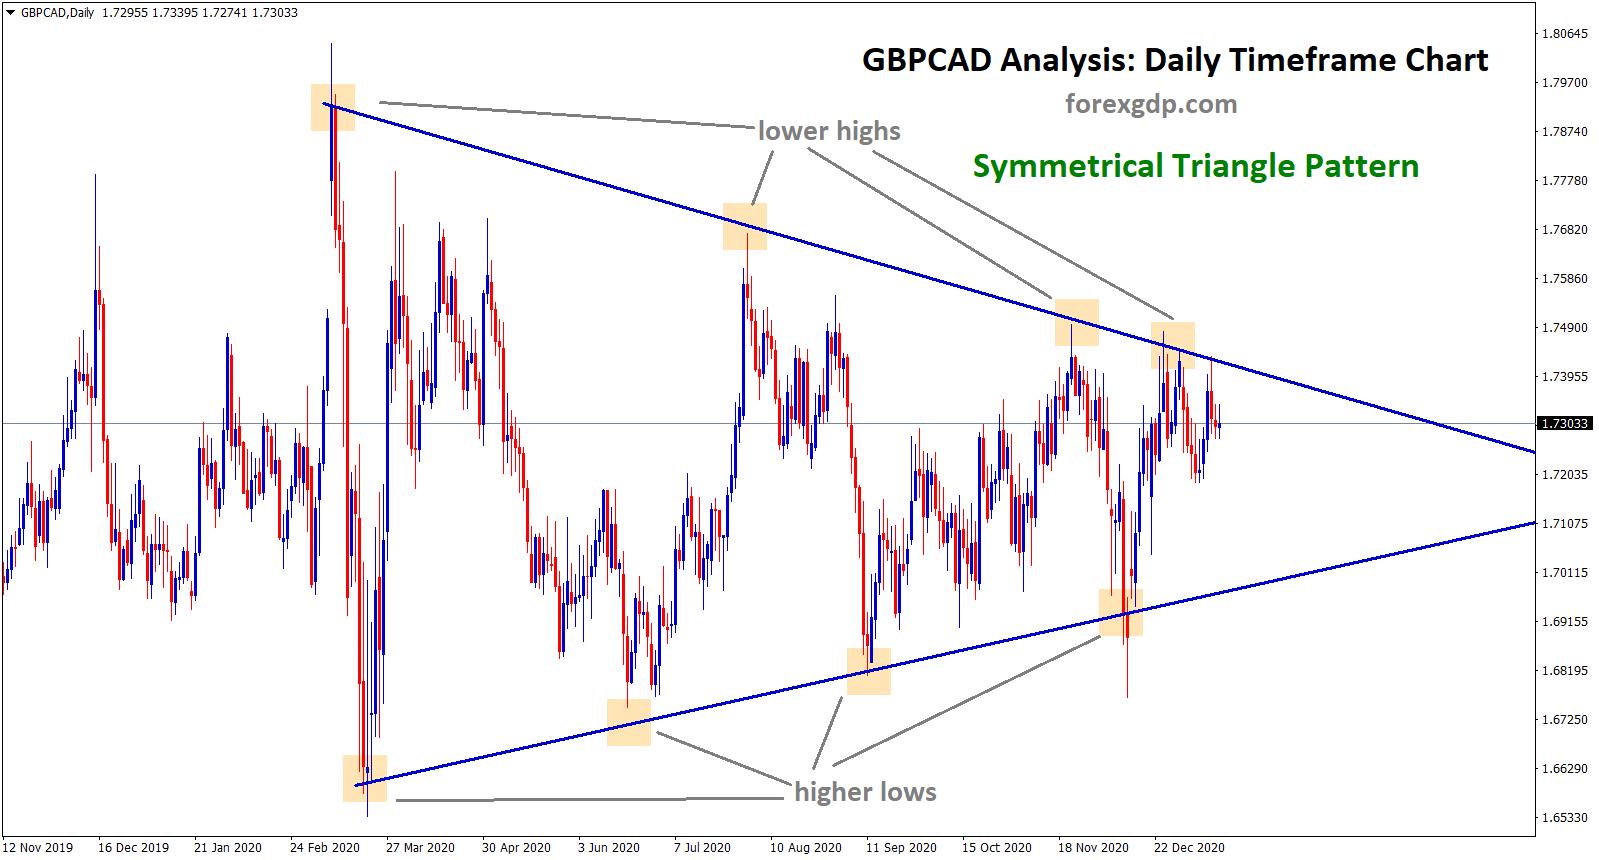 gbpcad analysis daily timeframe symmetrical triangle